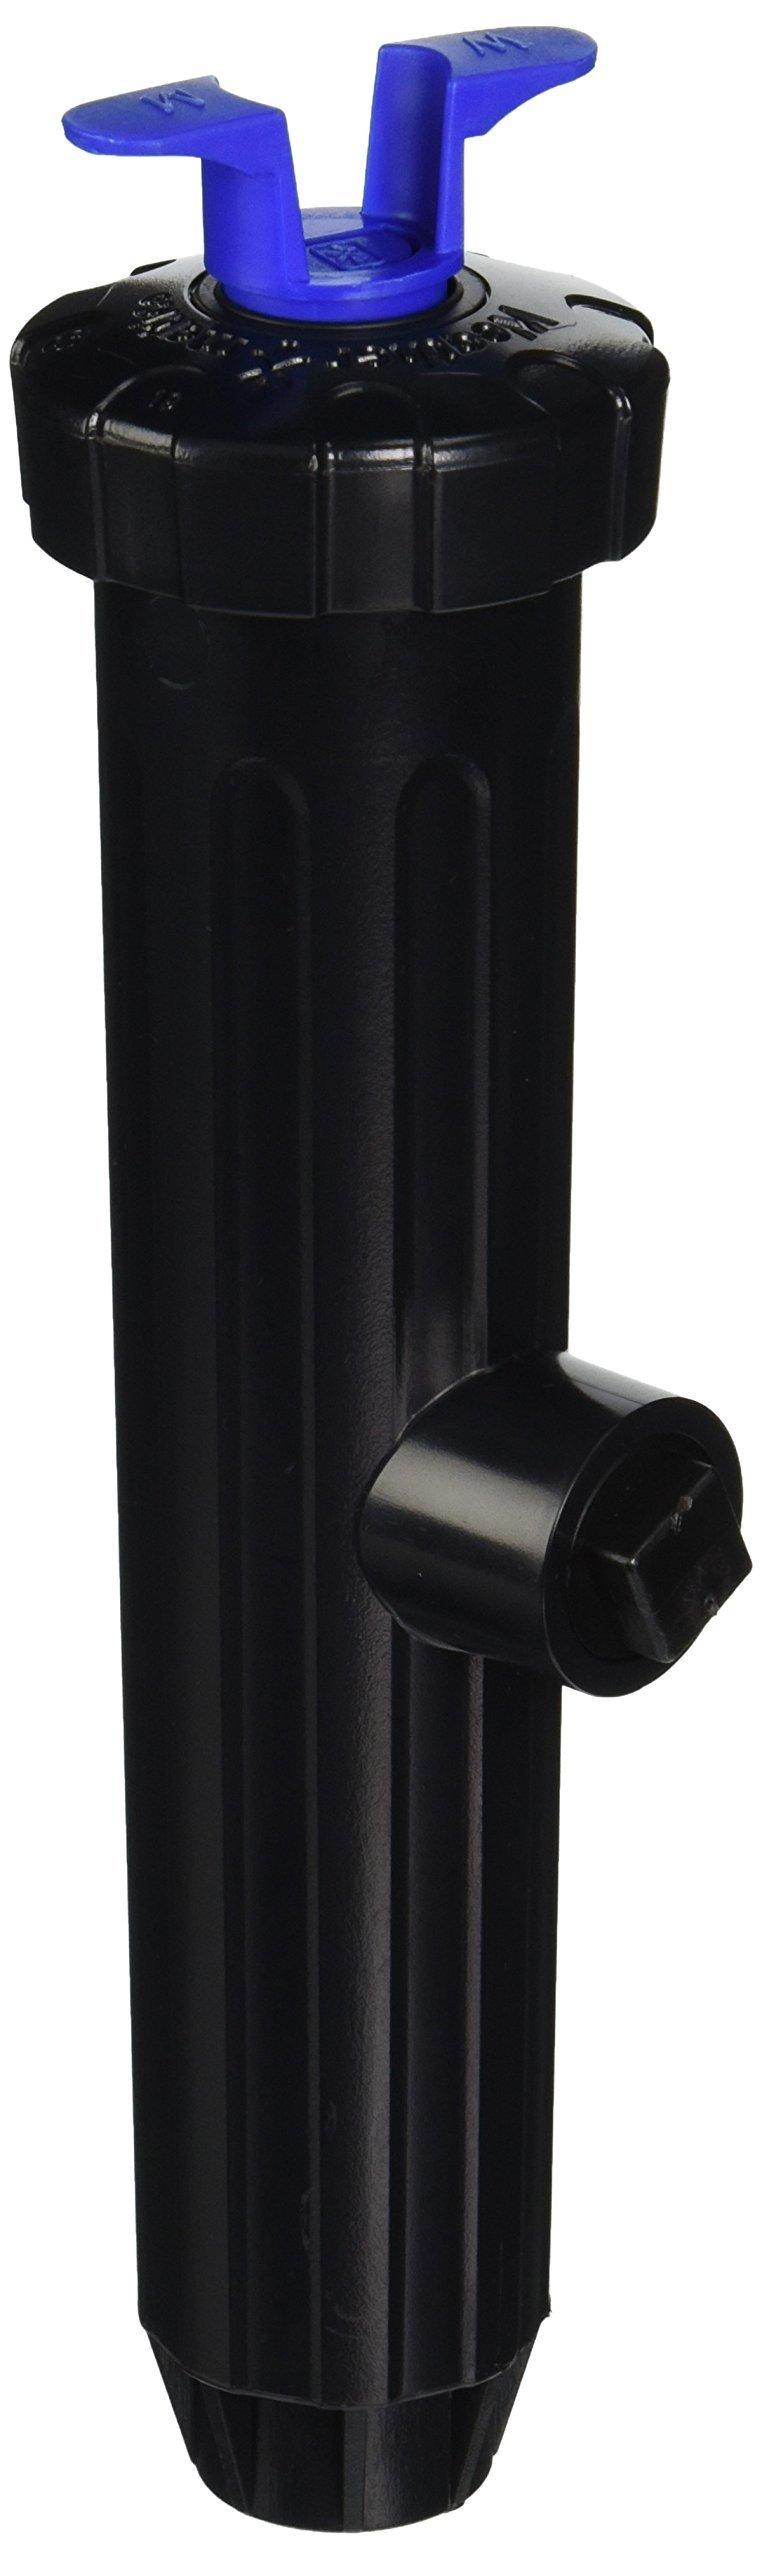 Weathermatic Lx Pop-Up Sprayhead - 6'' Plastic